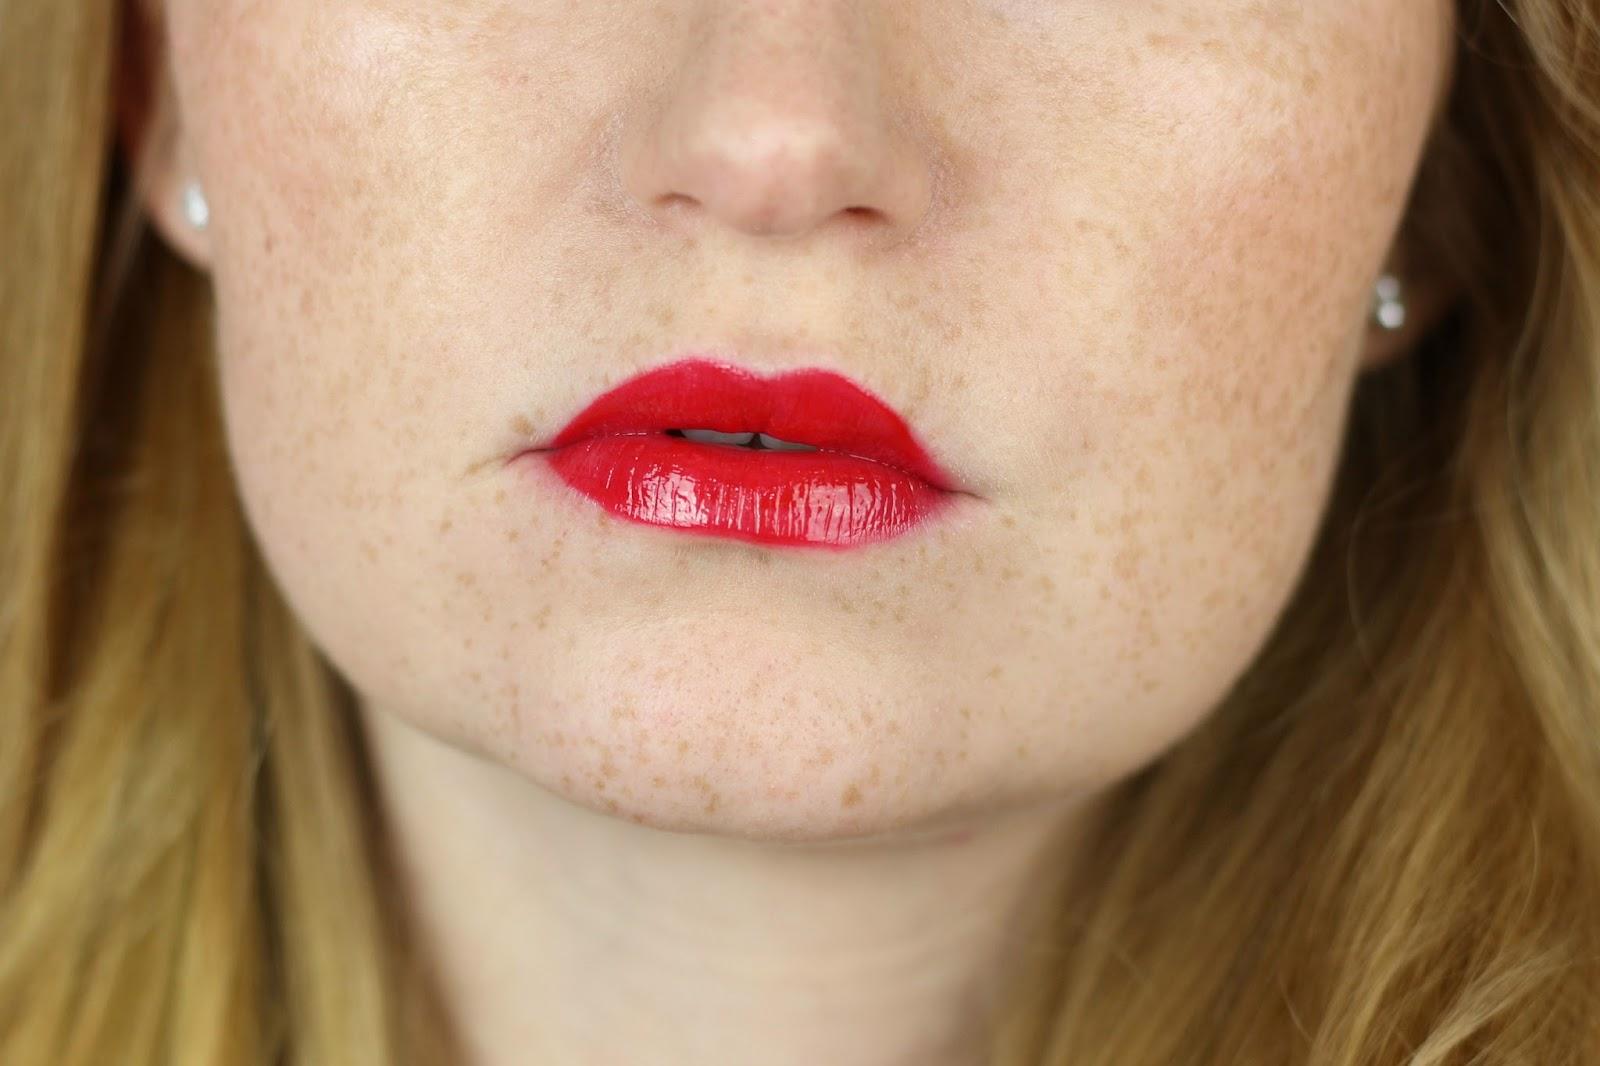 CATRICE, lipgloss, lippenstift, liquid lipstick, neues sortiment, neuheiten, review, rose your voice, Shine Appeal Fluid Lipstick Intense, swatches, the olympink games, vampired diaries, tragebilder,